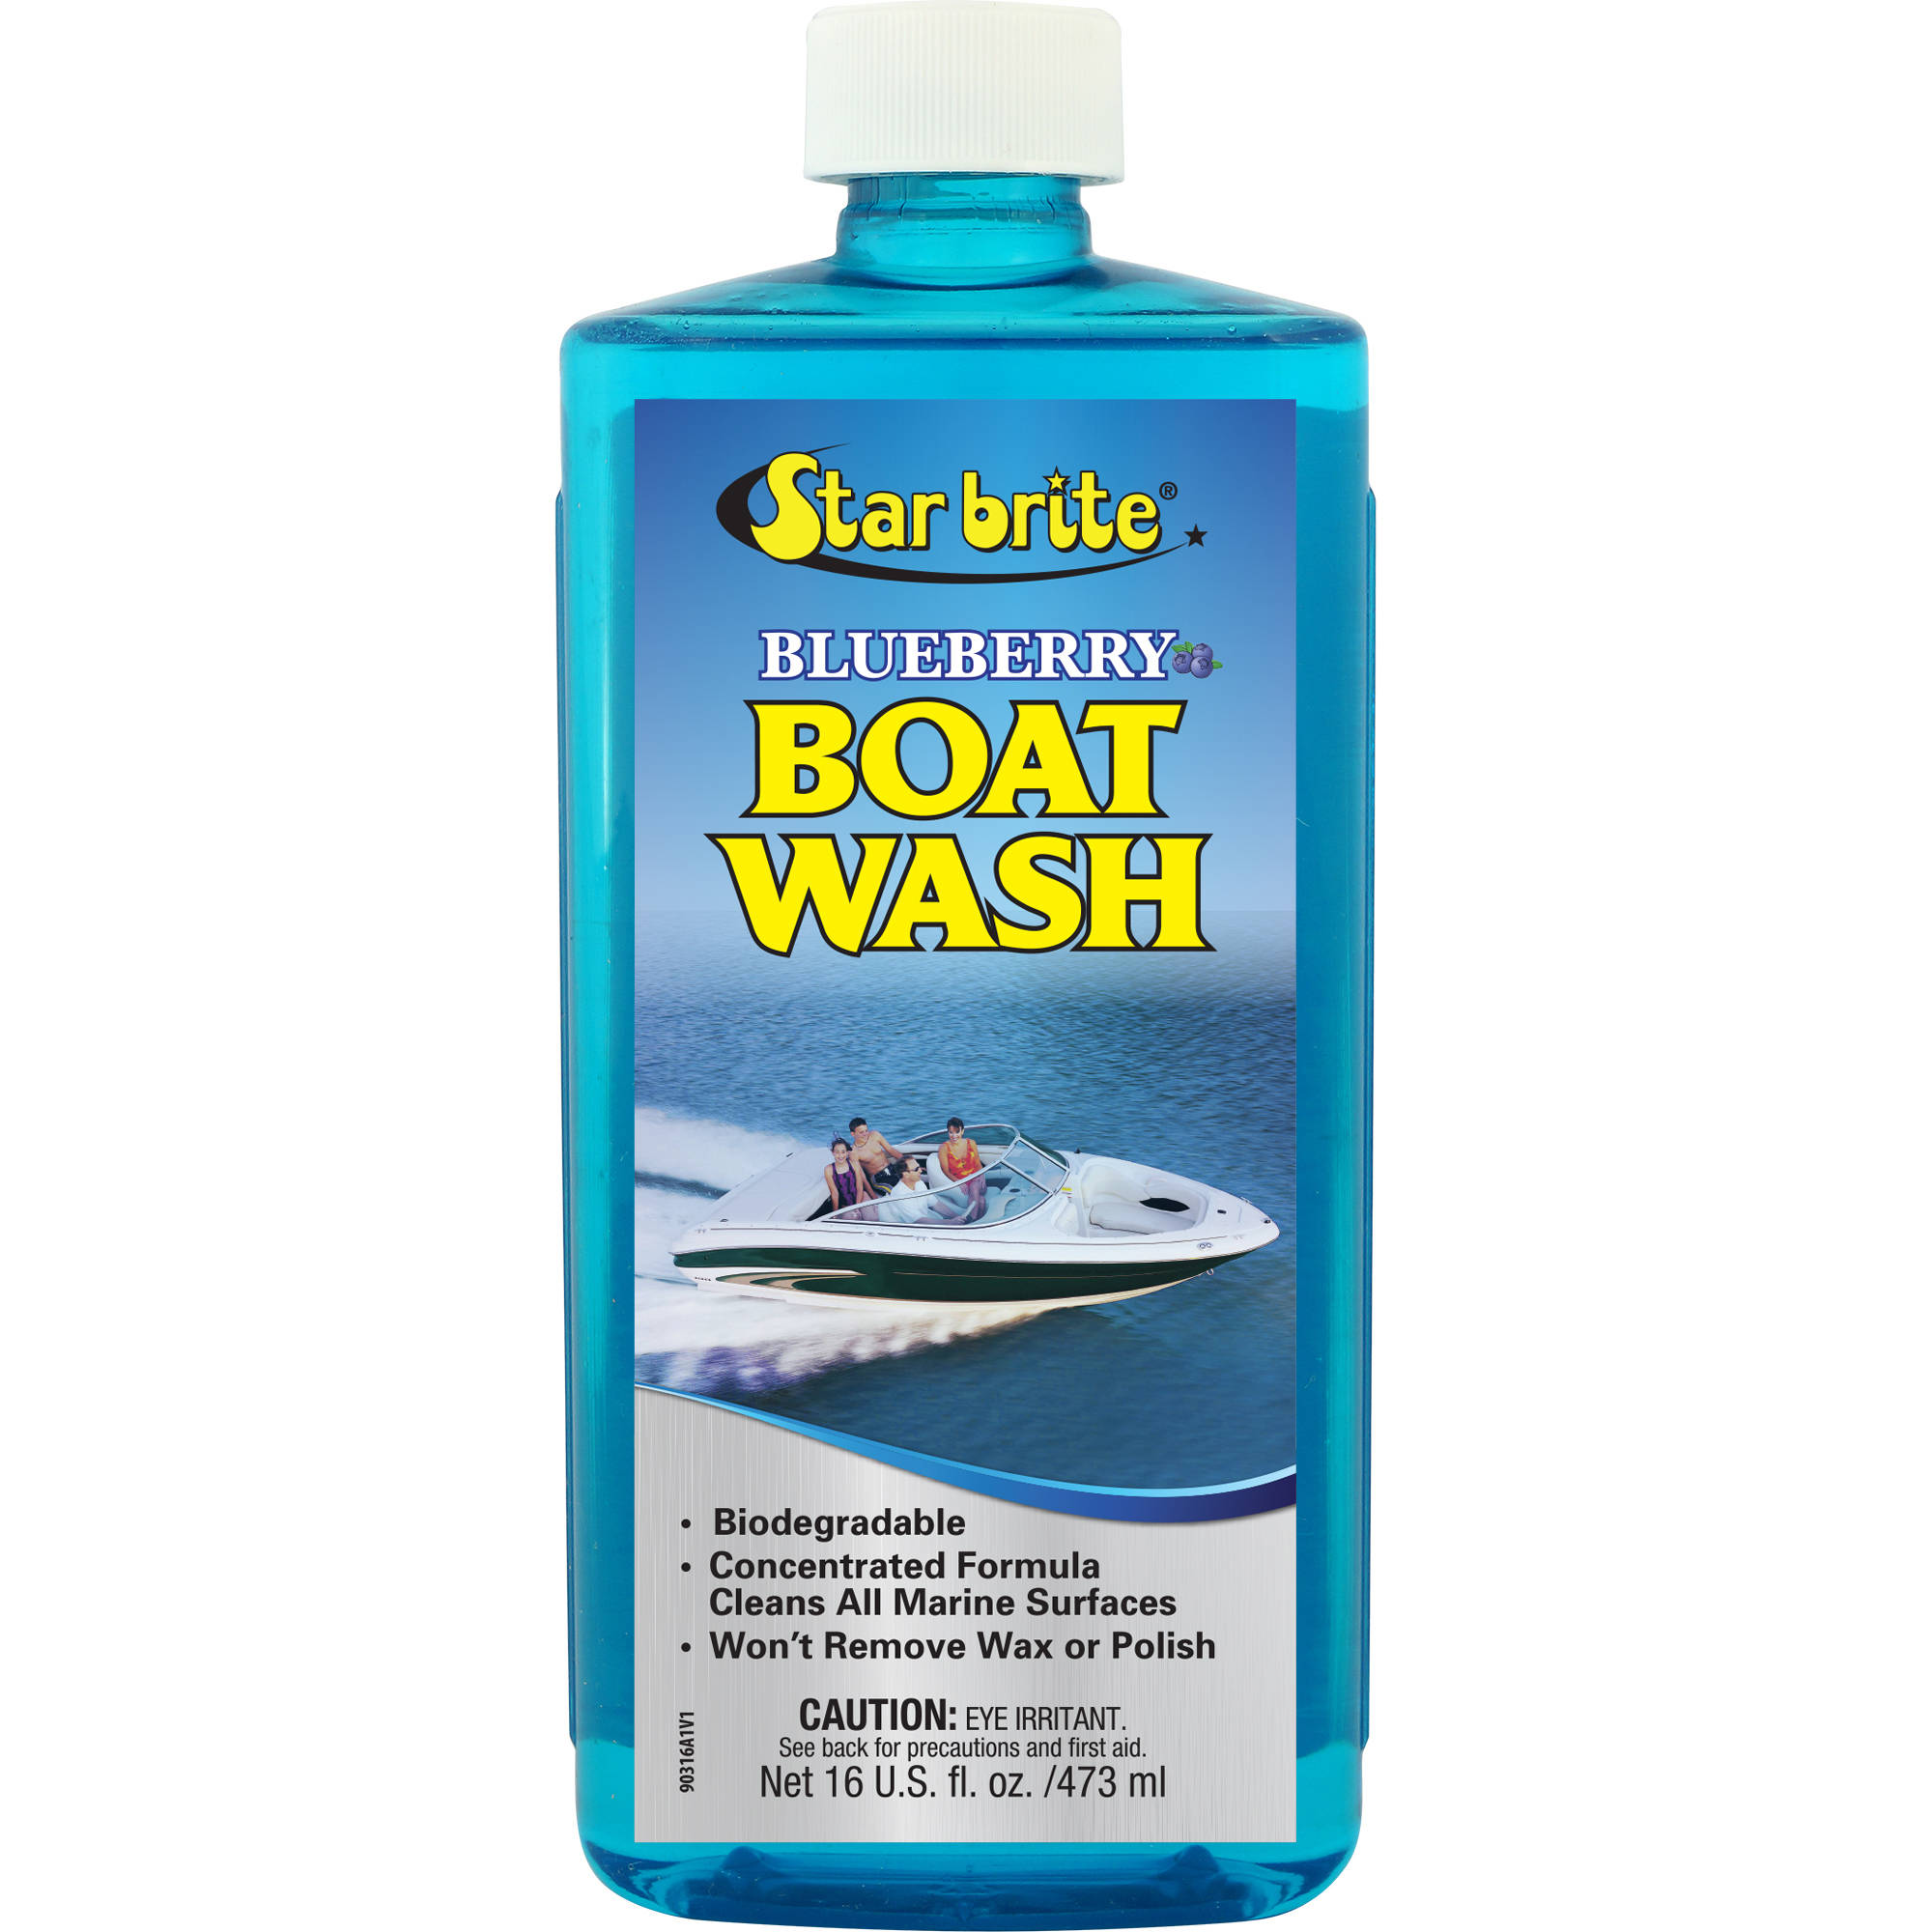 Star Brite Blueberry Boat Wash, 16 oz